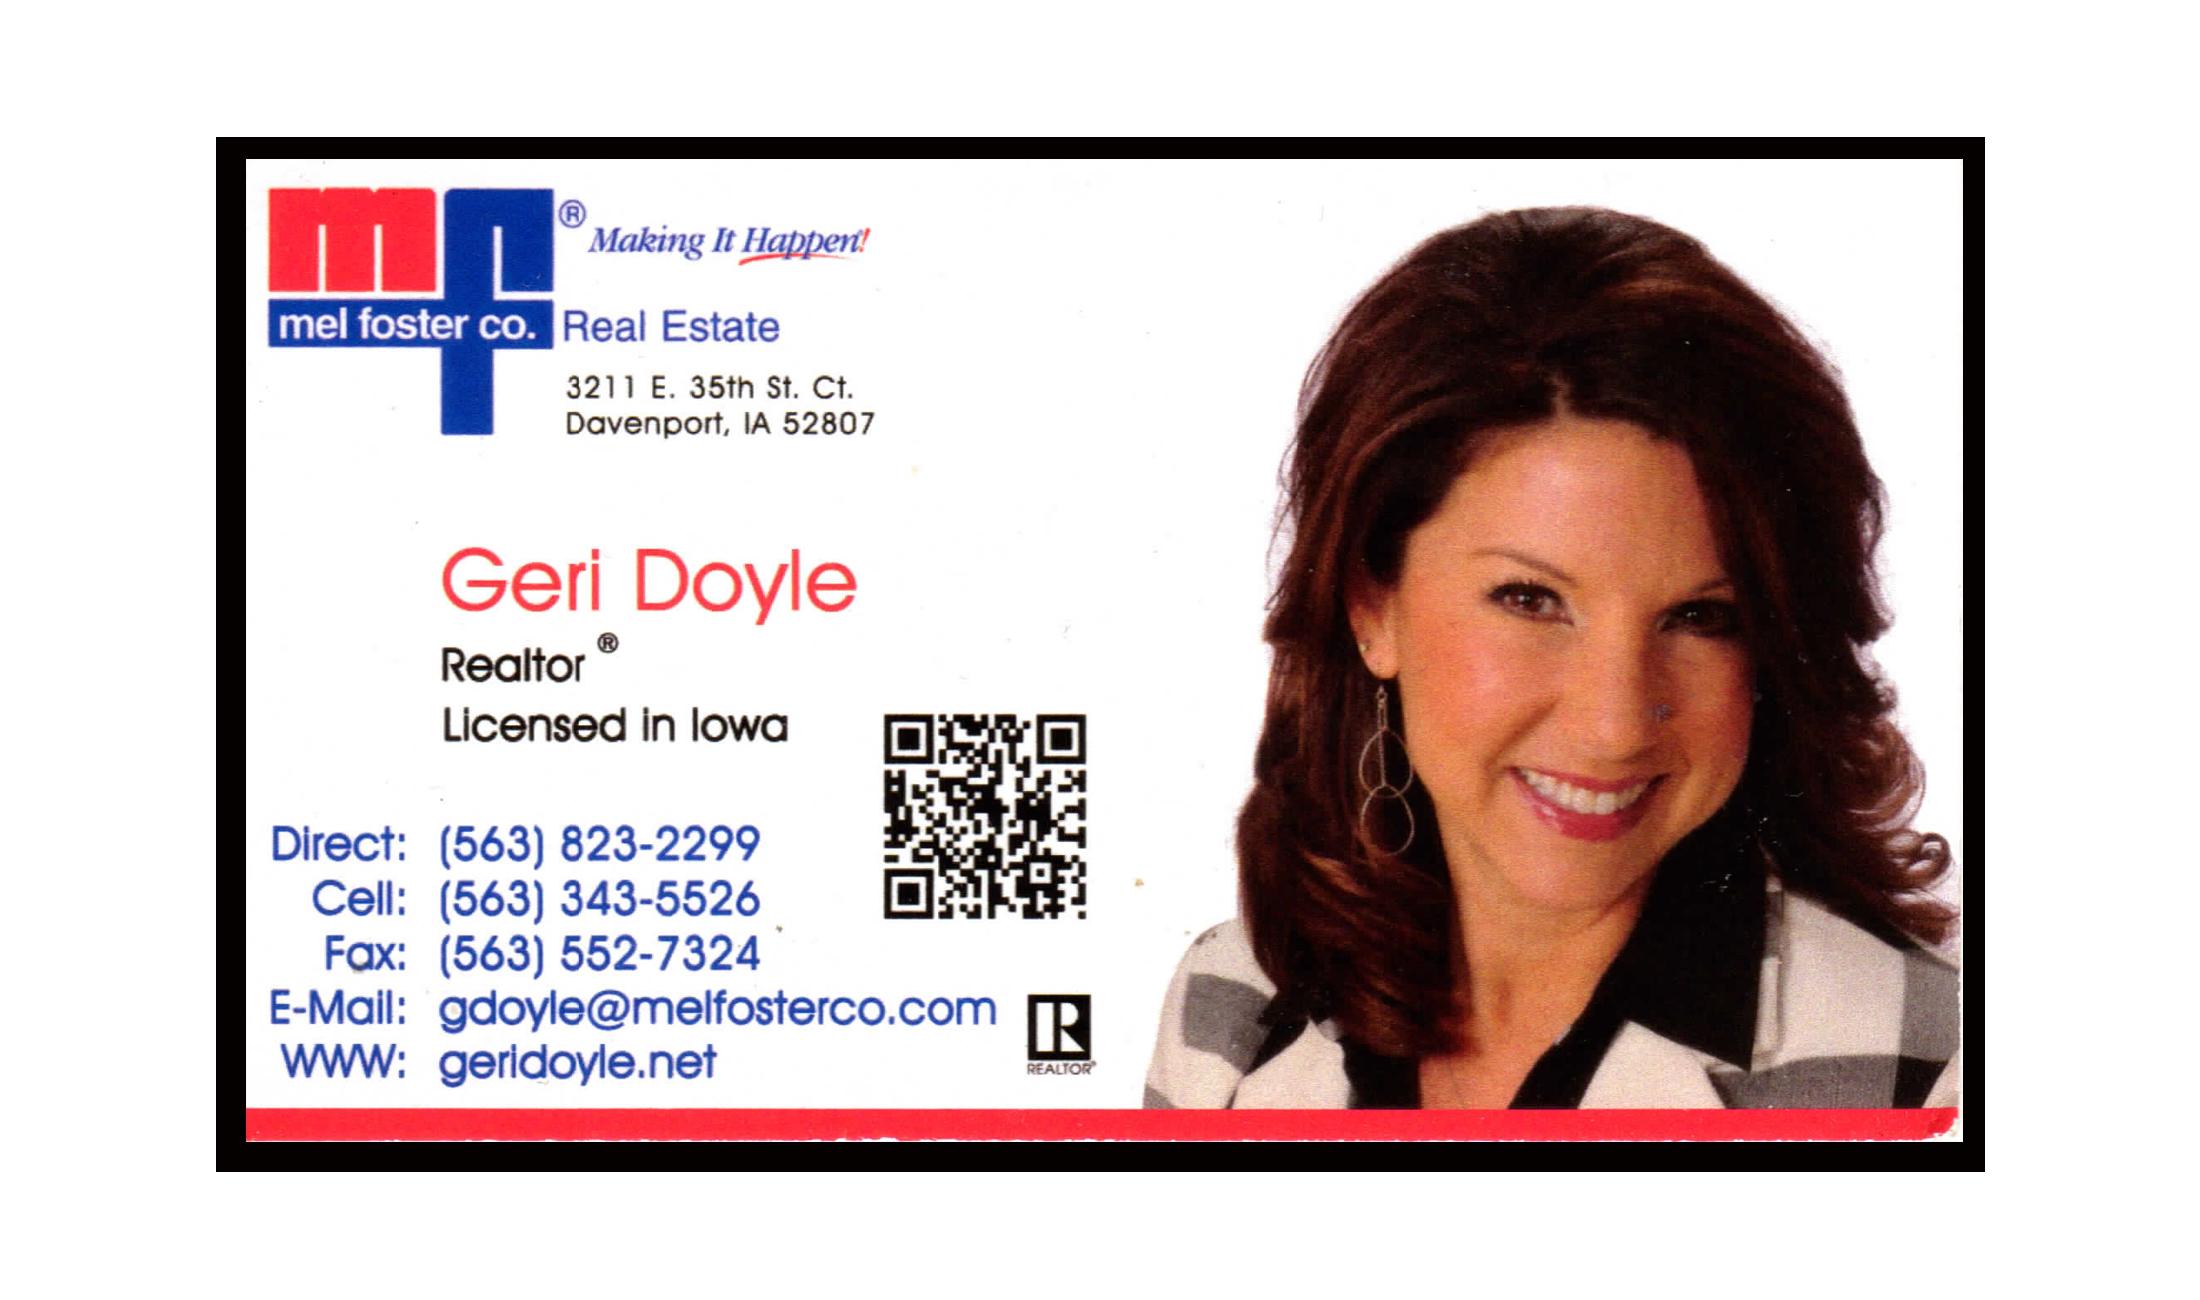 GERI DOYLE business card float